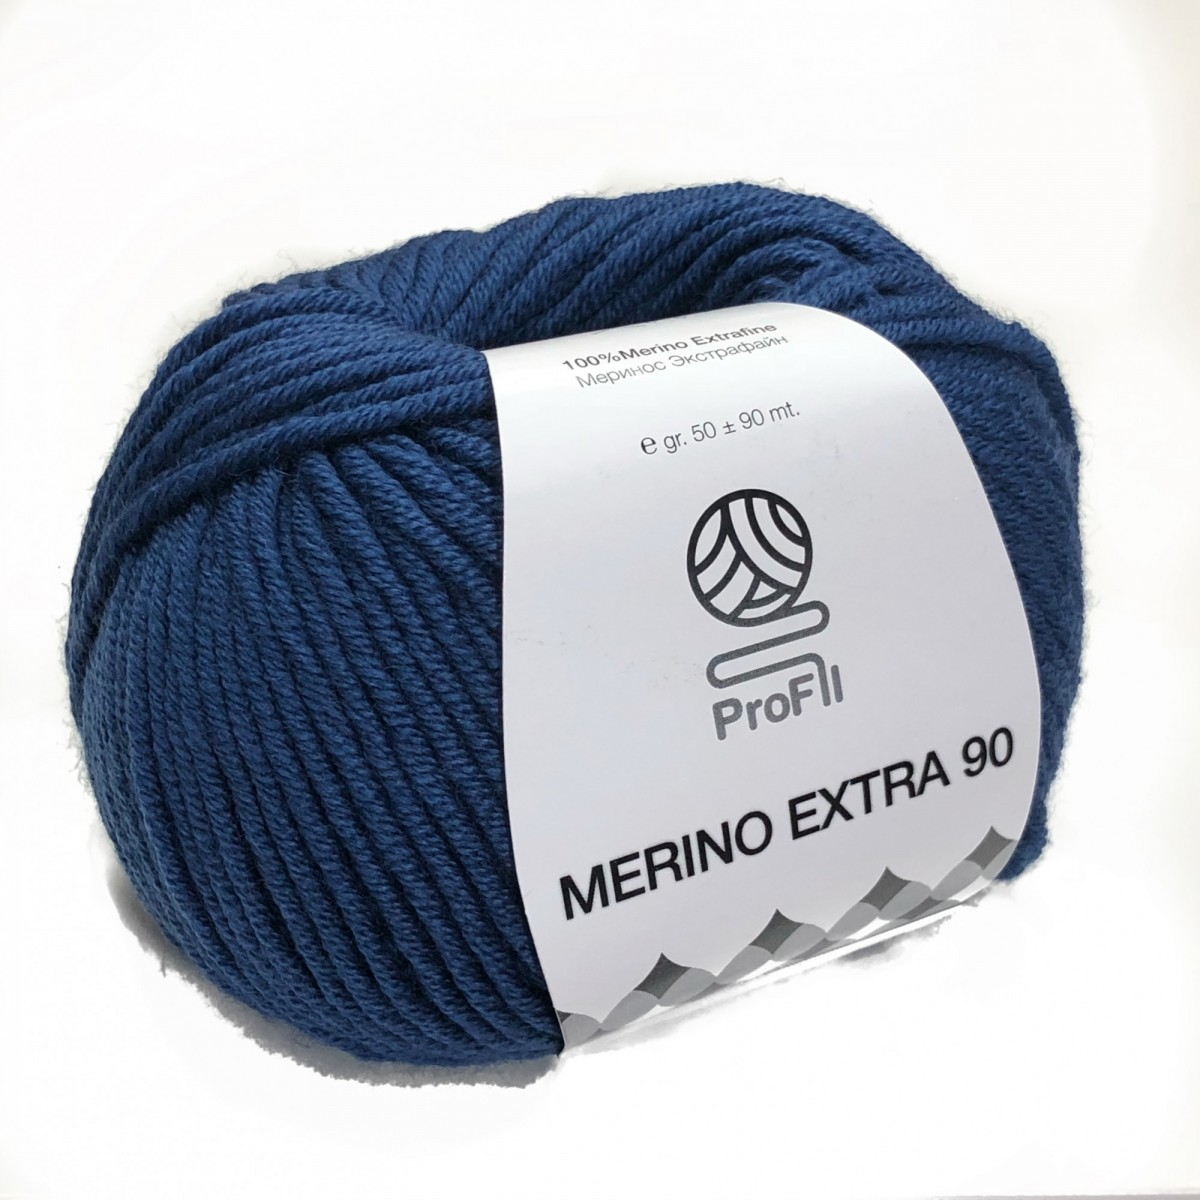 Пряжа Мерино экстра 90 (Merino Extra 90)